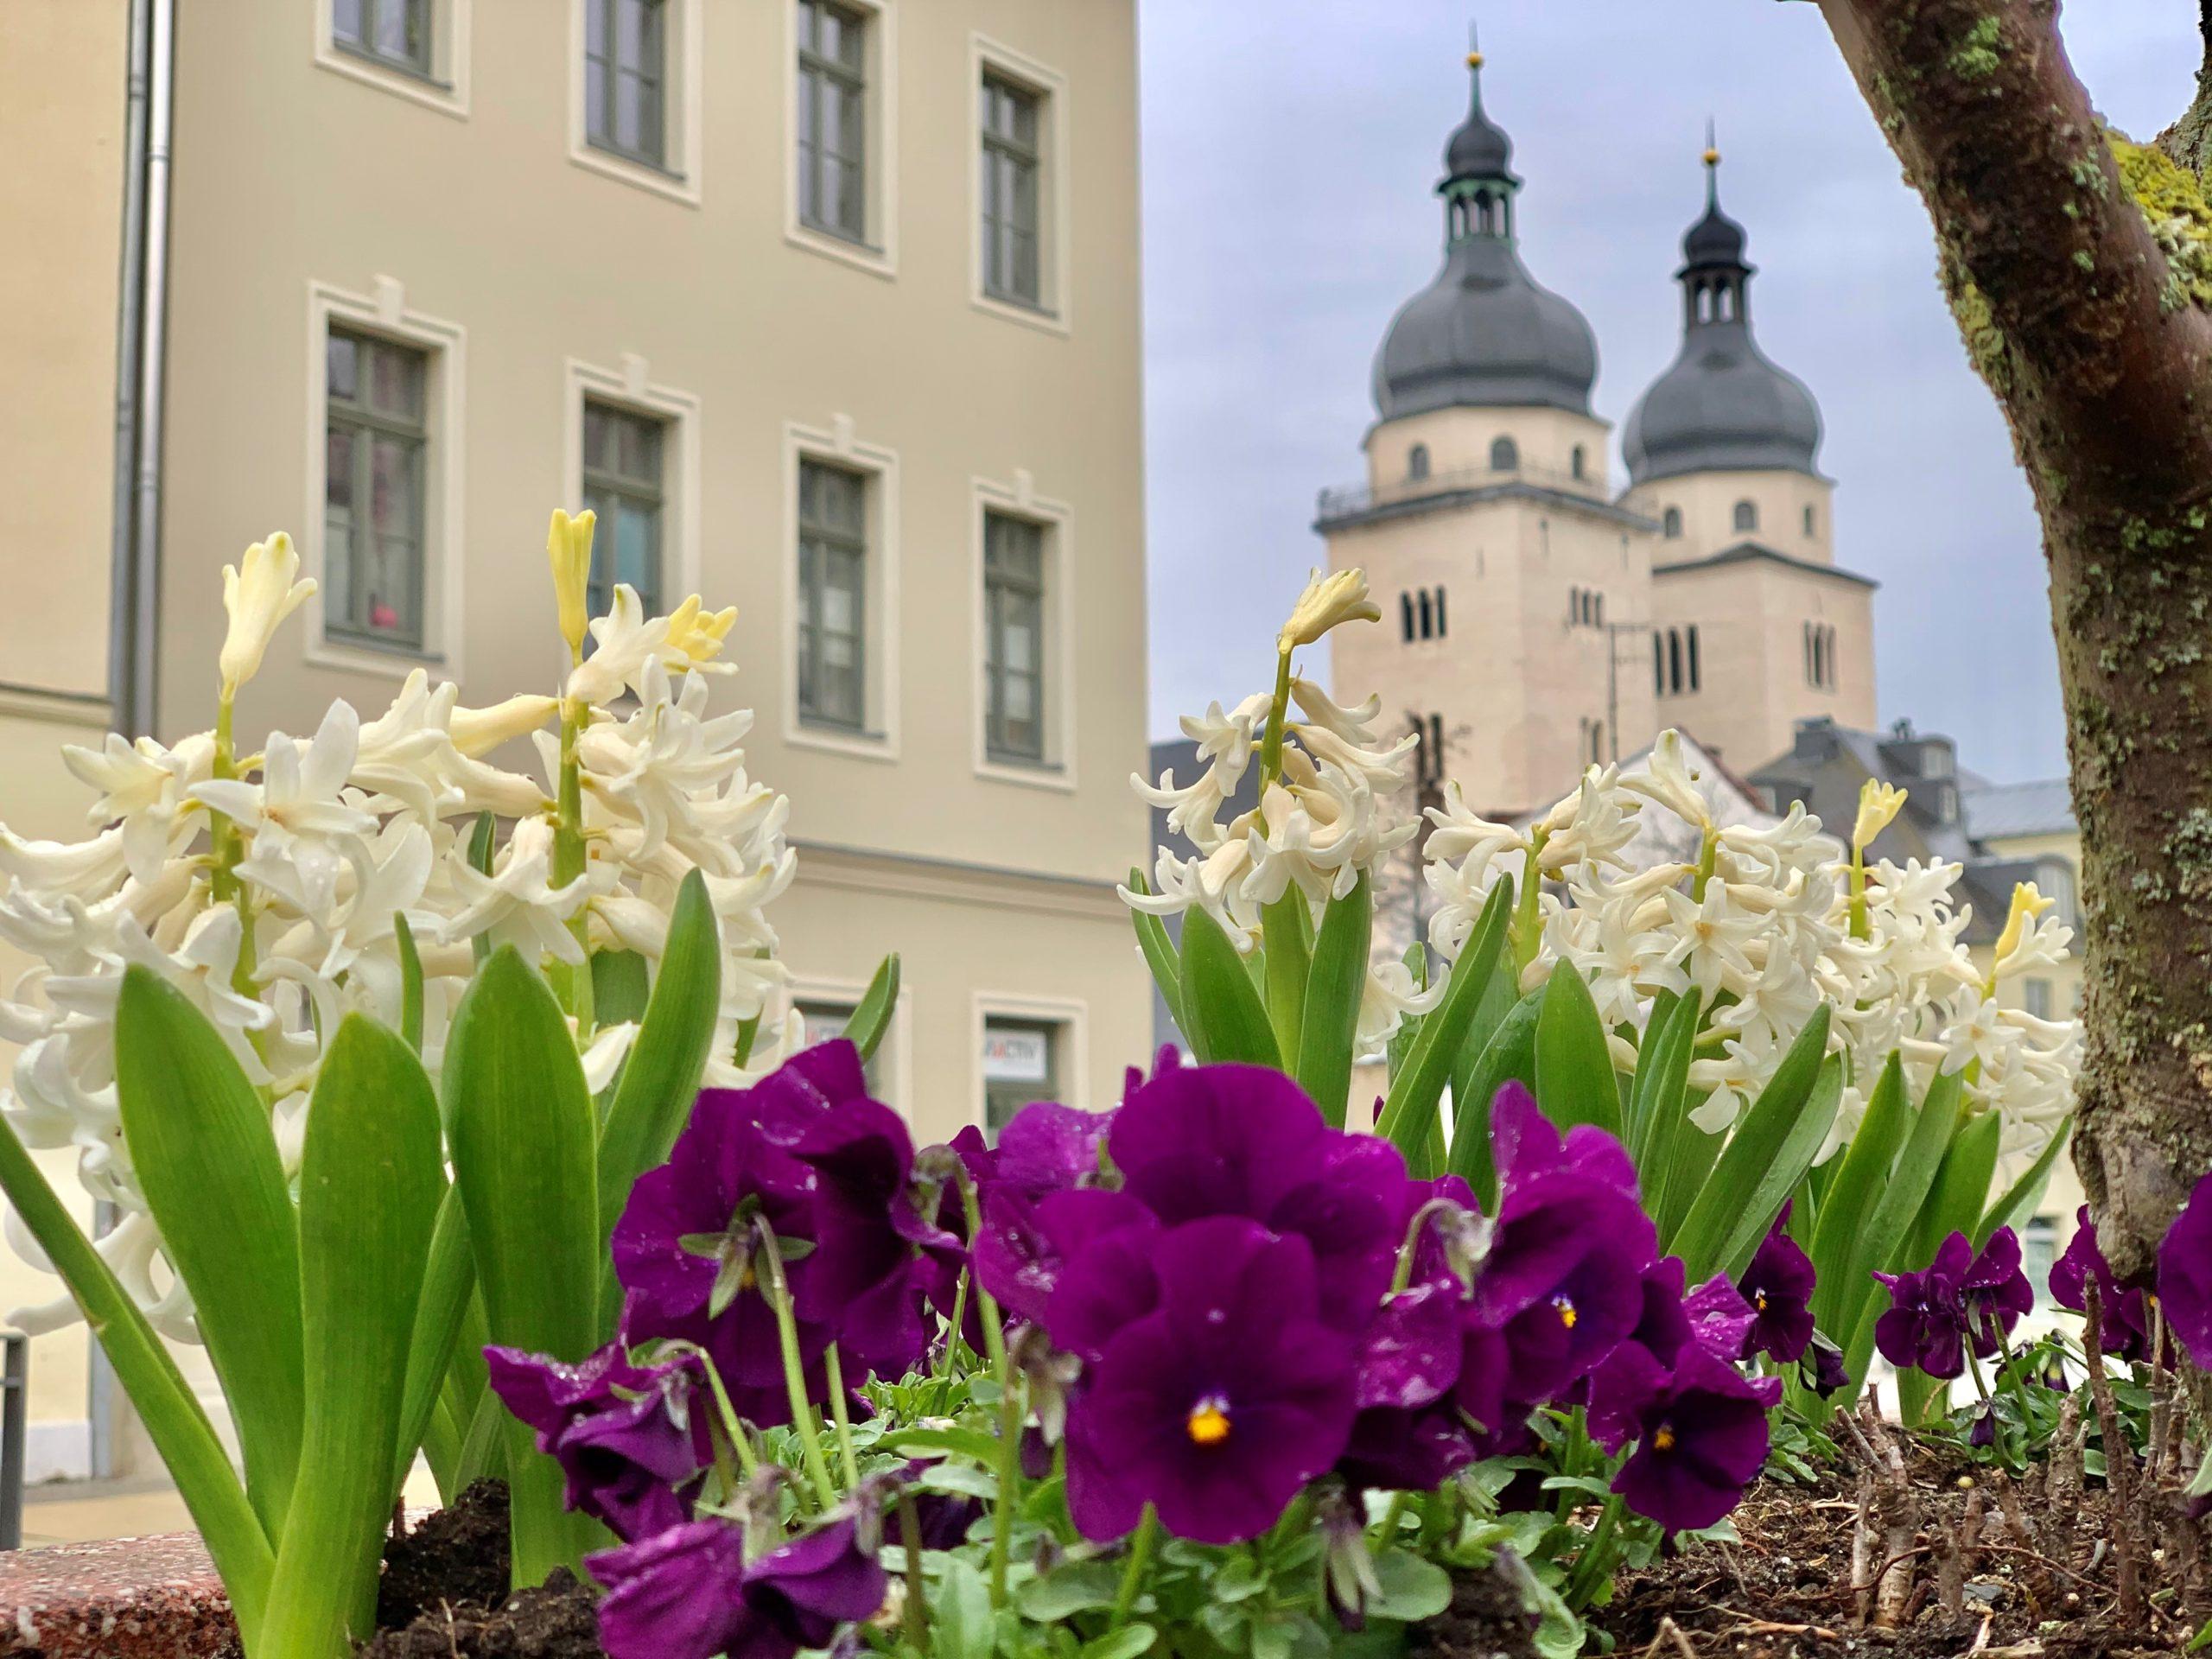 Frühlingsgrüße aus Plauen